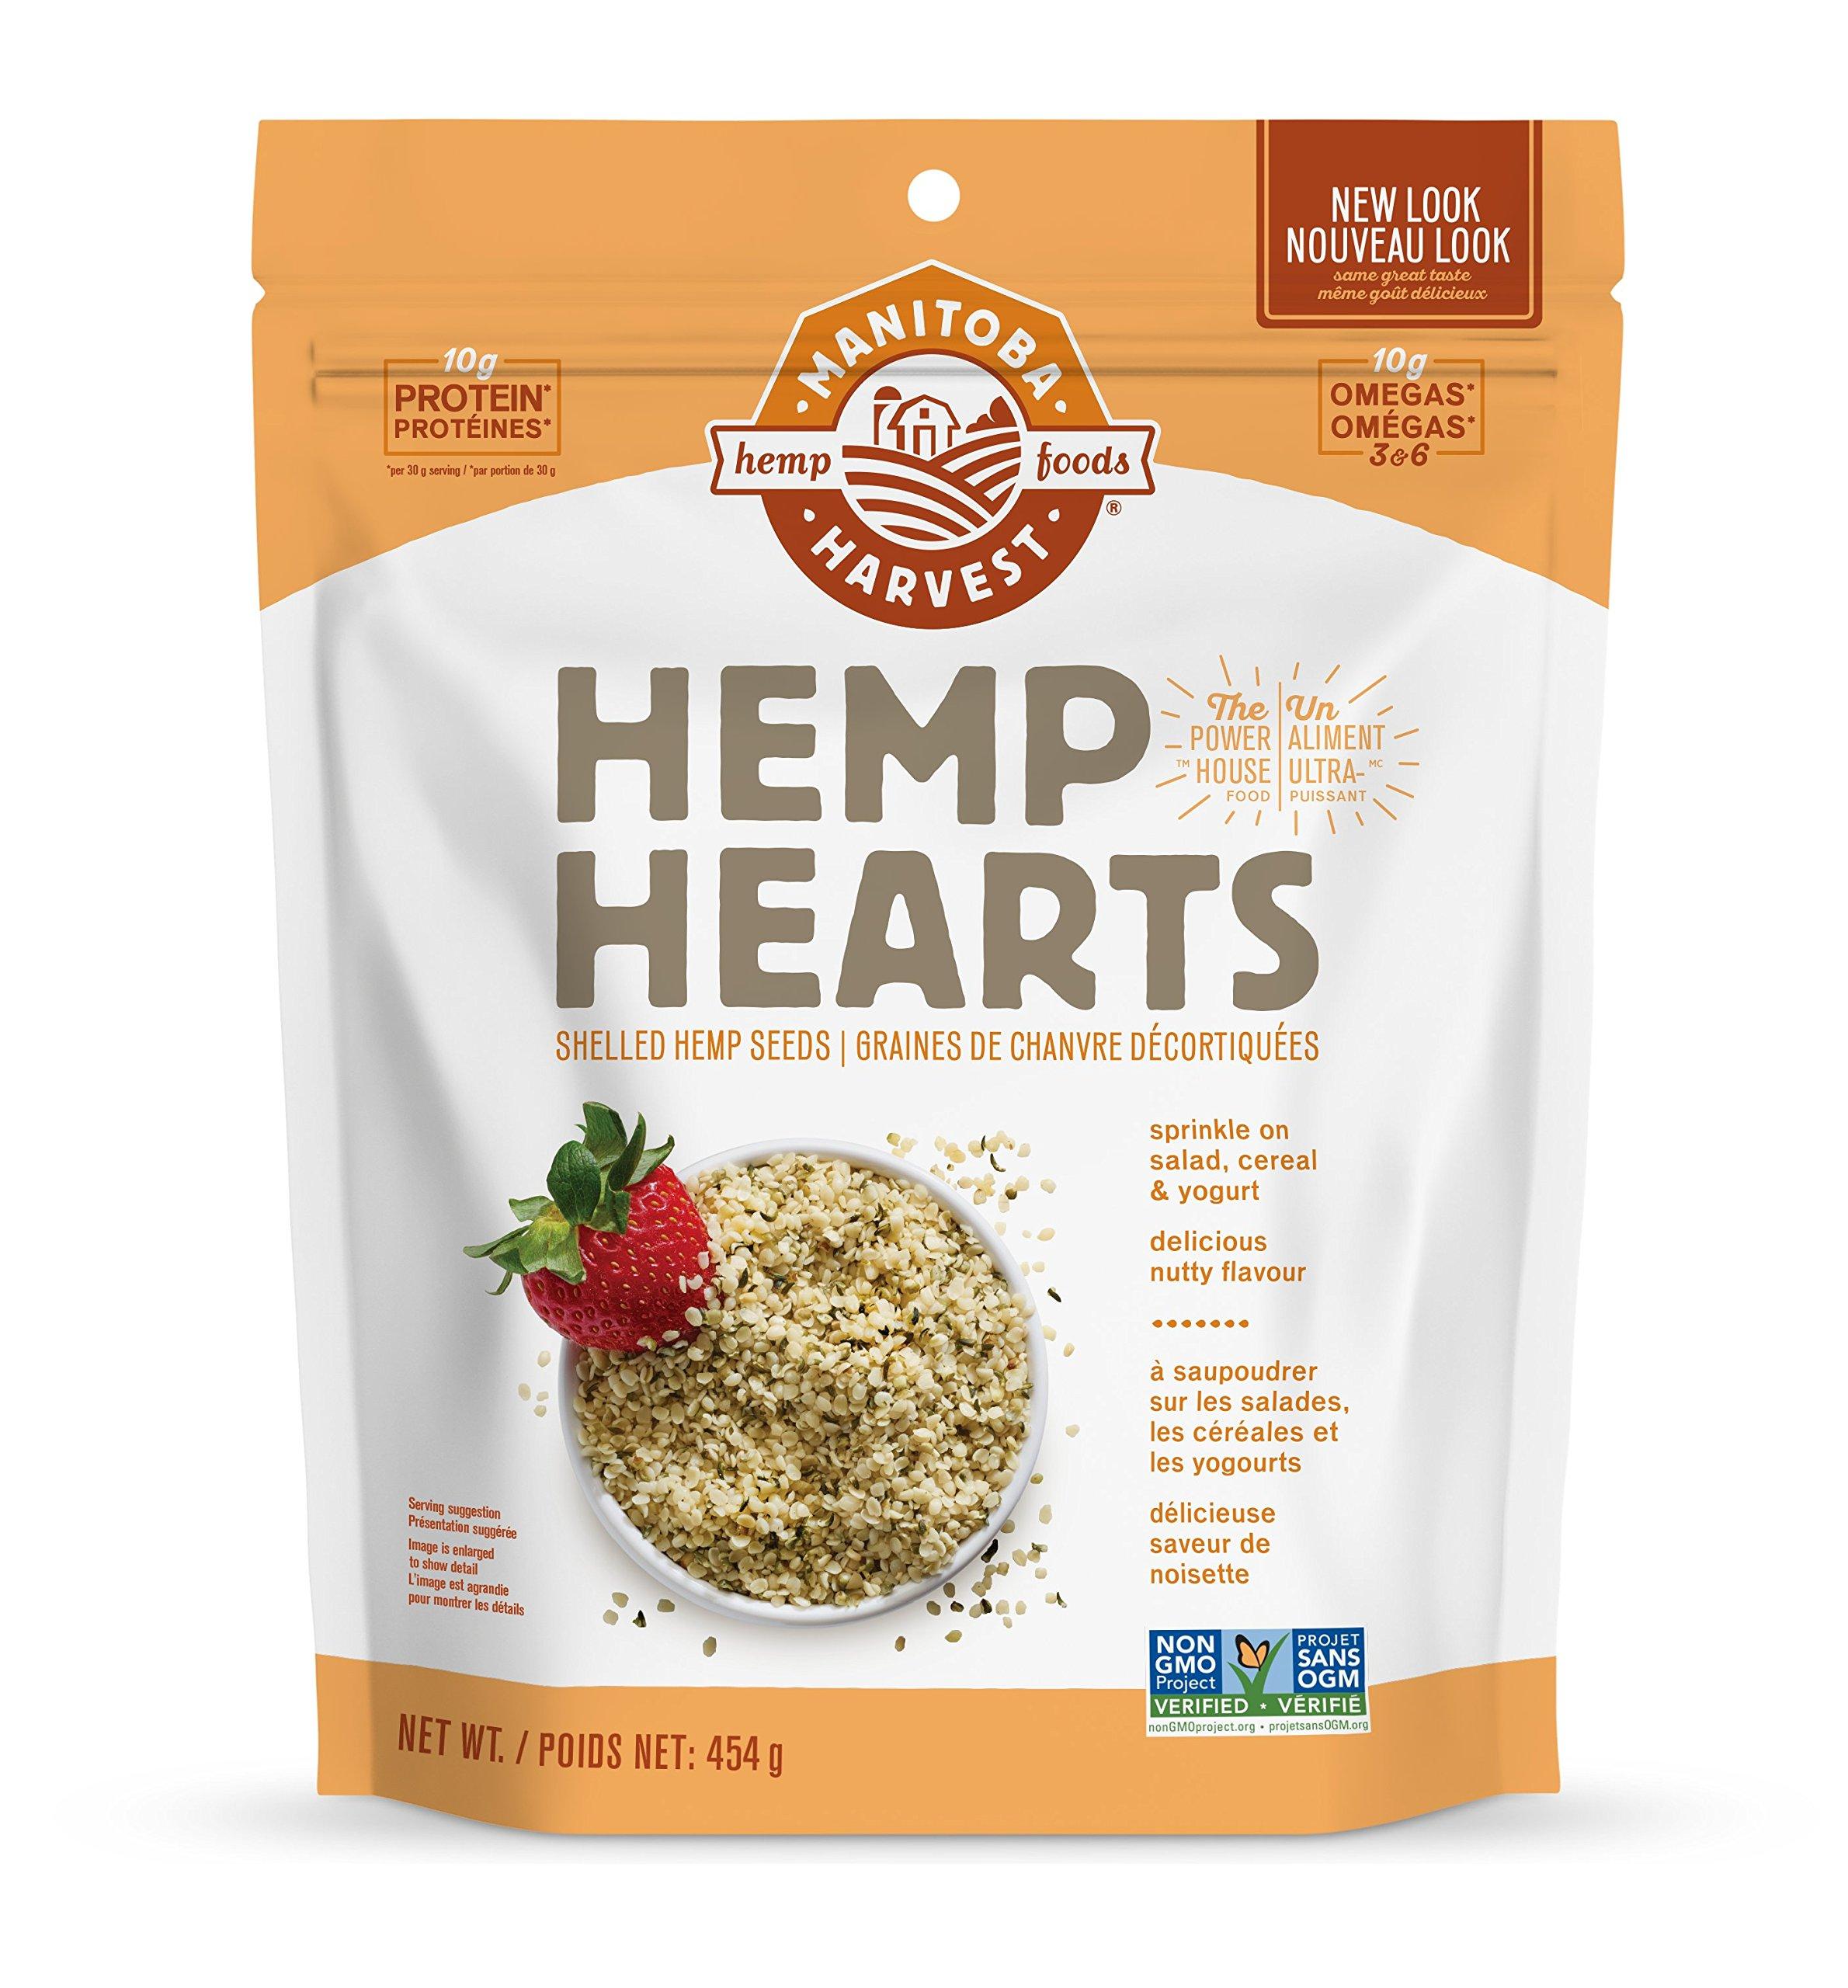 Manitoba Harvest Hemp Hearts Raw Shelled Hemp Seeds, Natural, 454g Bag - Packaging May Vary - Imported from Canada